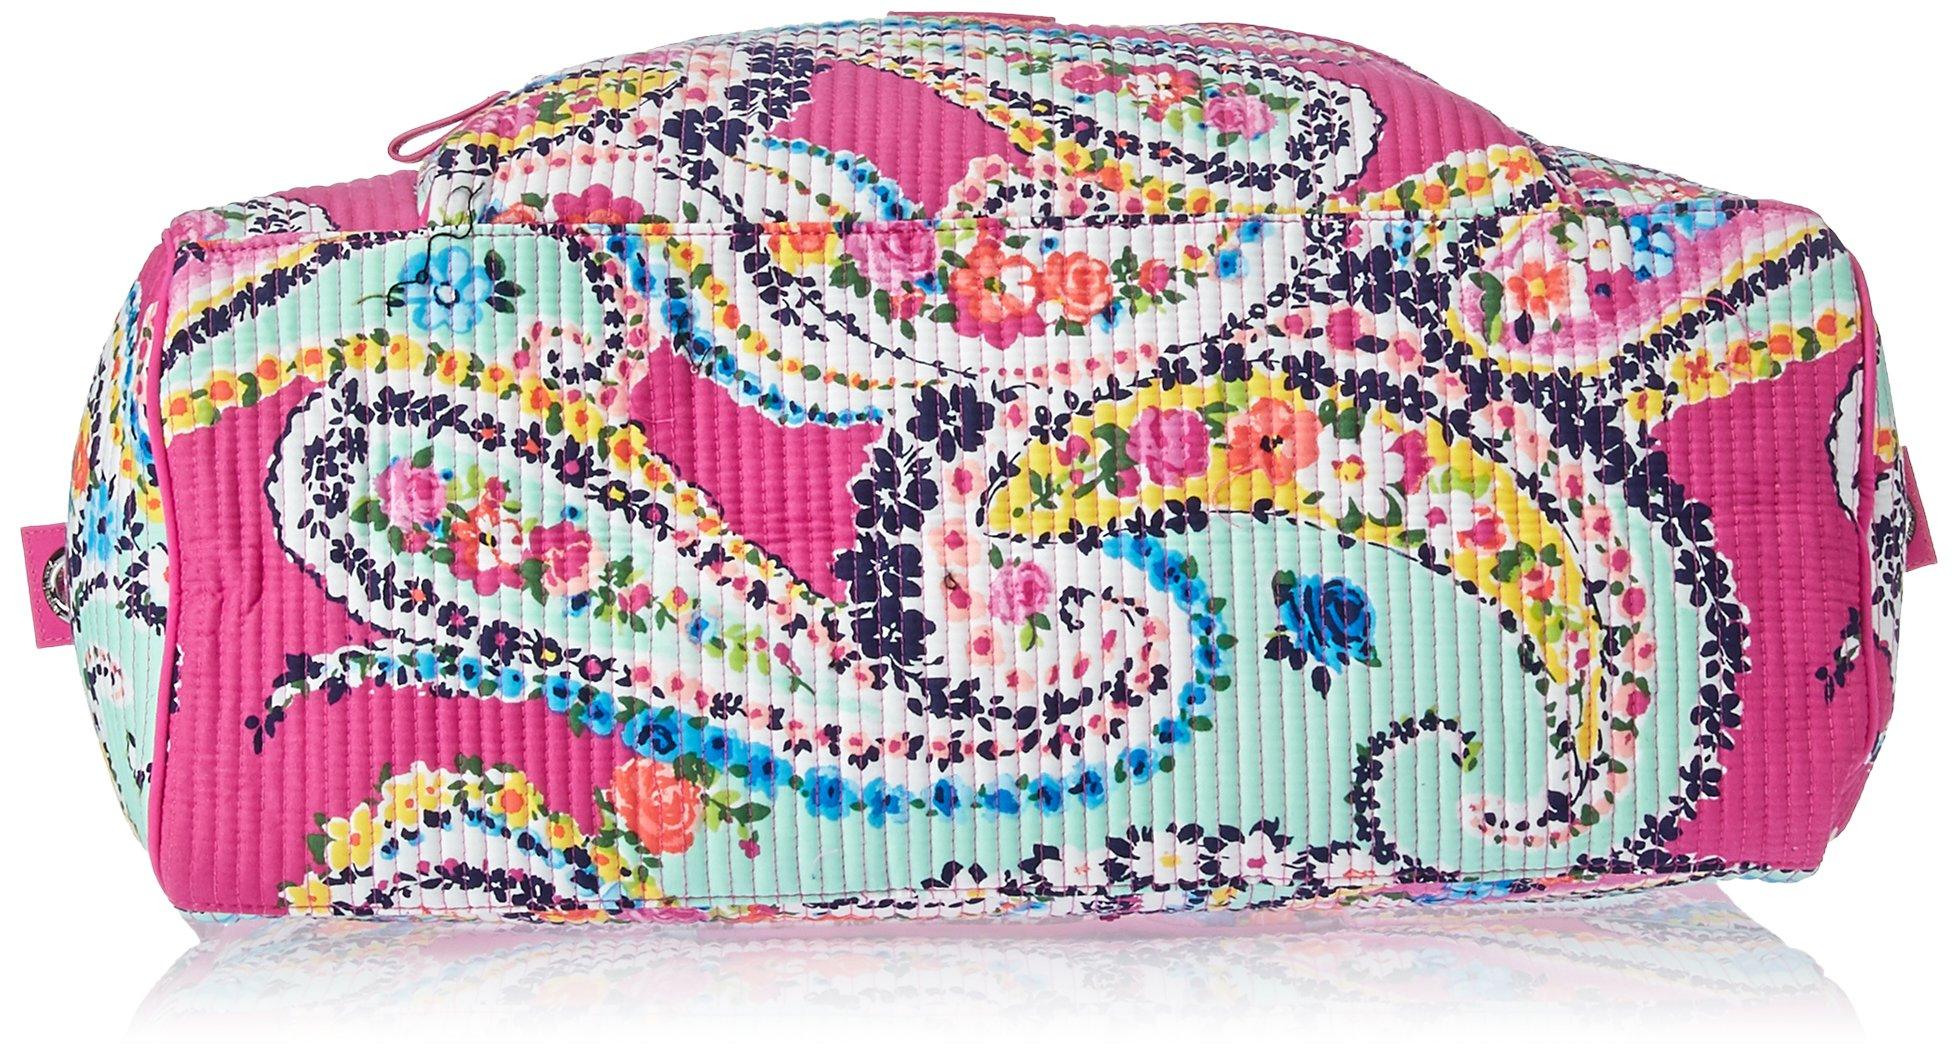 Vera Bradley Iconic Deluxe Weekender Travel Bag, Signature Cotton by Vera Bradley (Image #4)